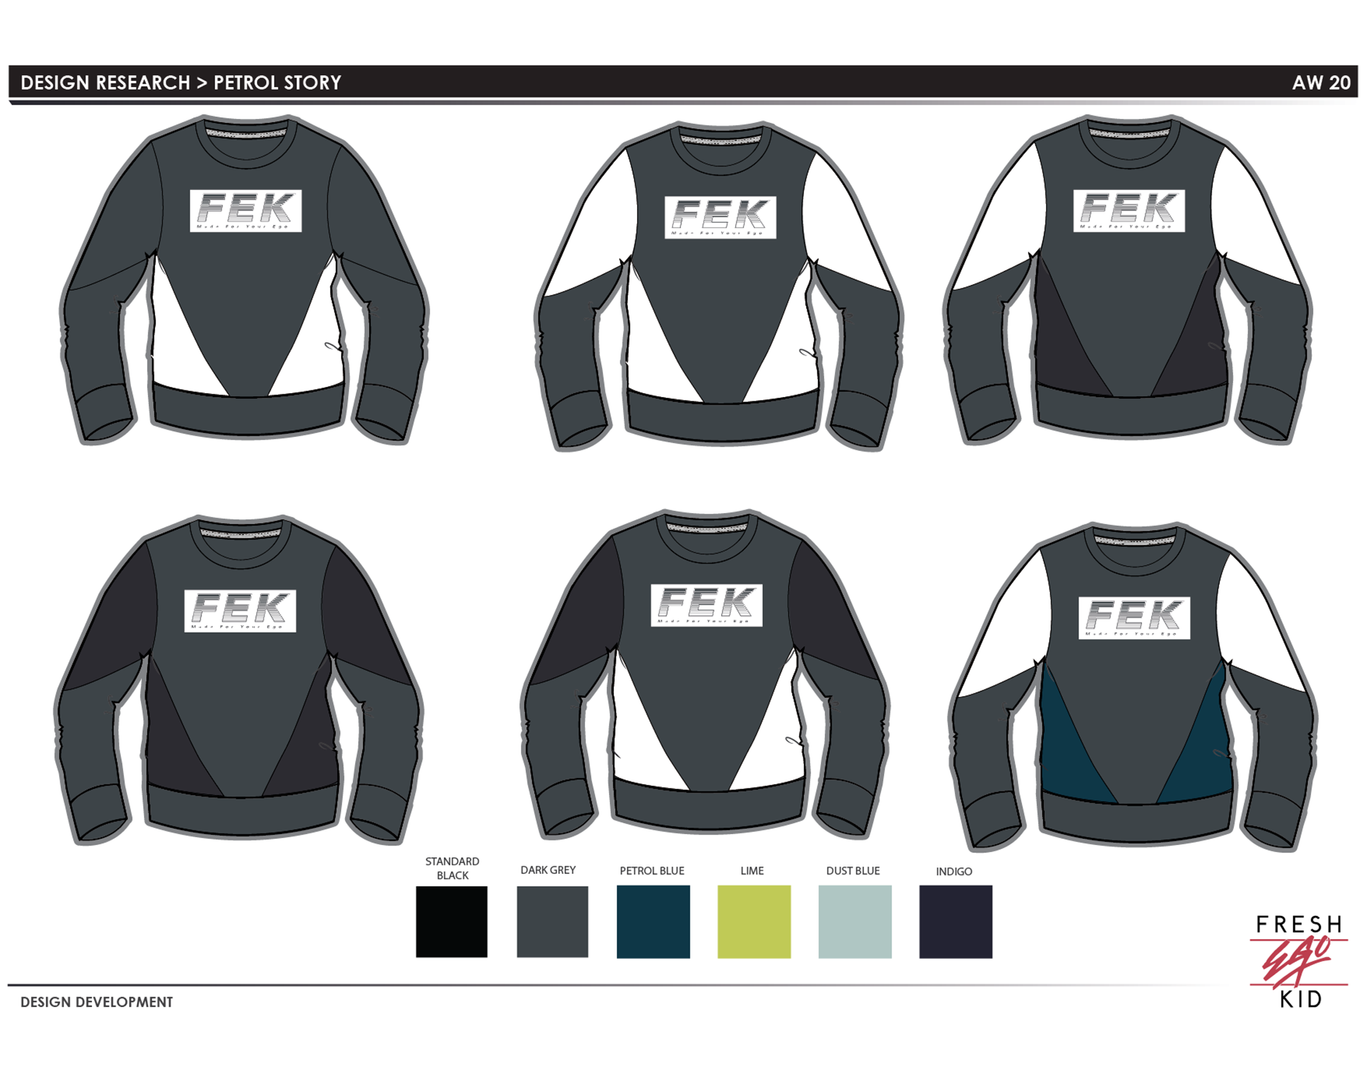 FEK - Crew sweater design 4